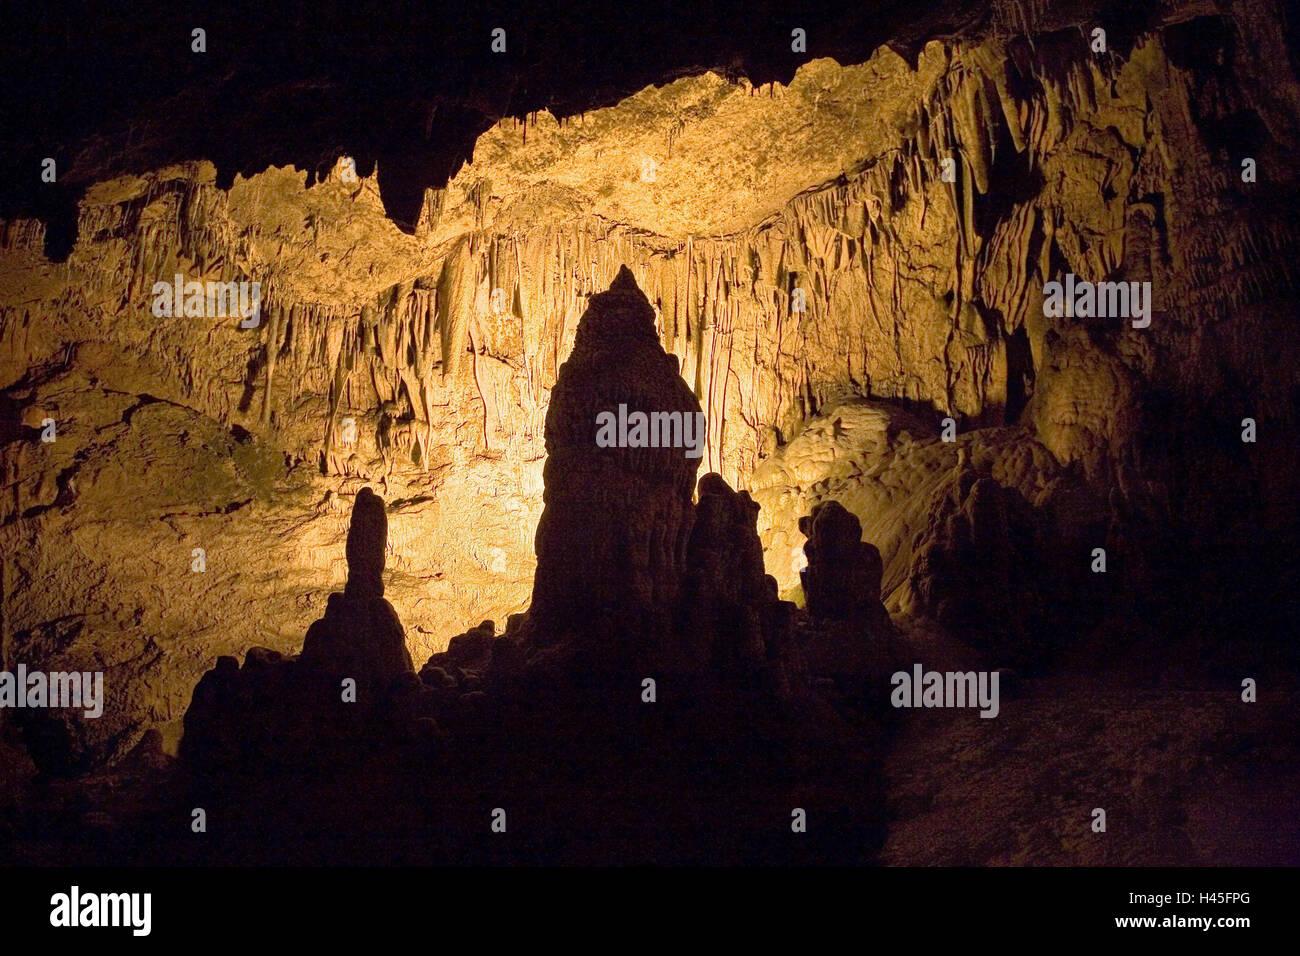 Turkey province Antalya limestone cave lighting pit drip stones stones rock pit stalagmite to stalactites place of interest attraction tourism ... & Turkey province Antalya limestone cave lighting pit drip stones ...